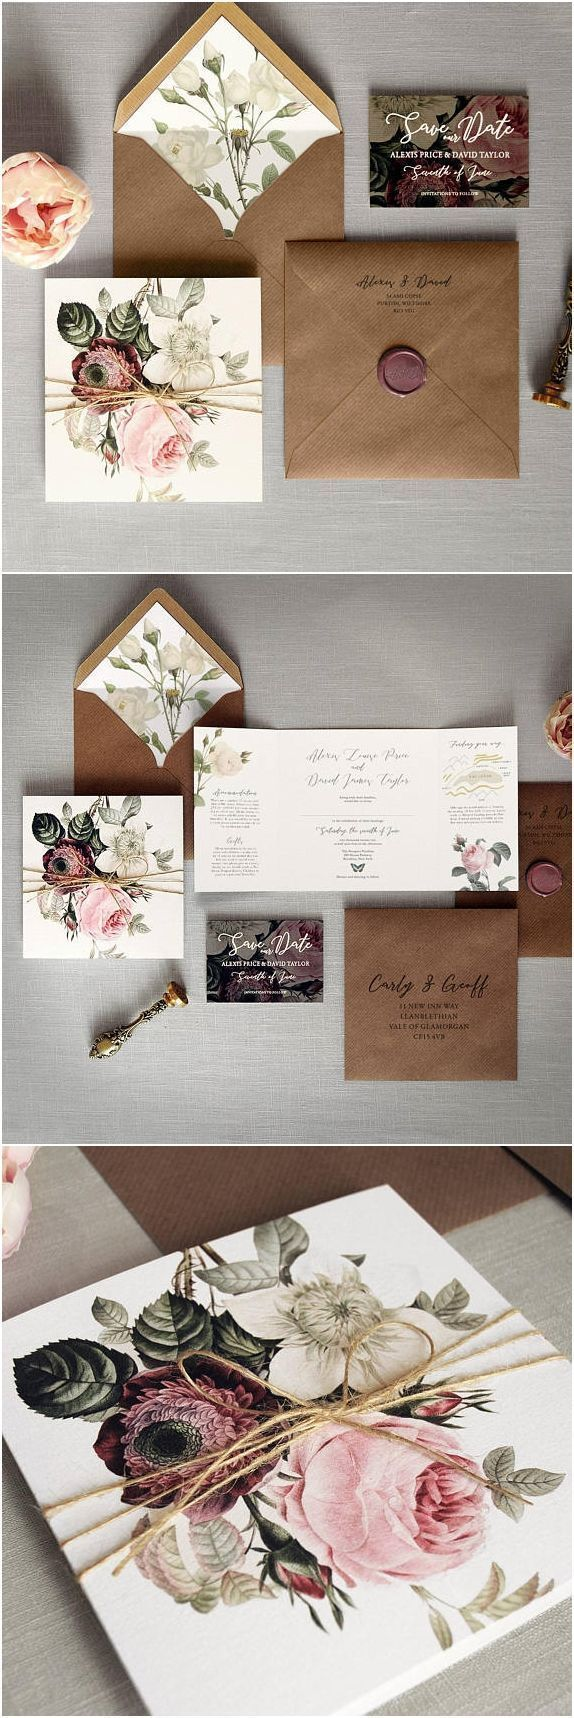 English Garden - Luxury Folding Wedding Invitations & Save the Date ...